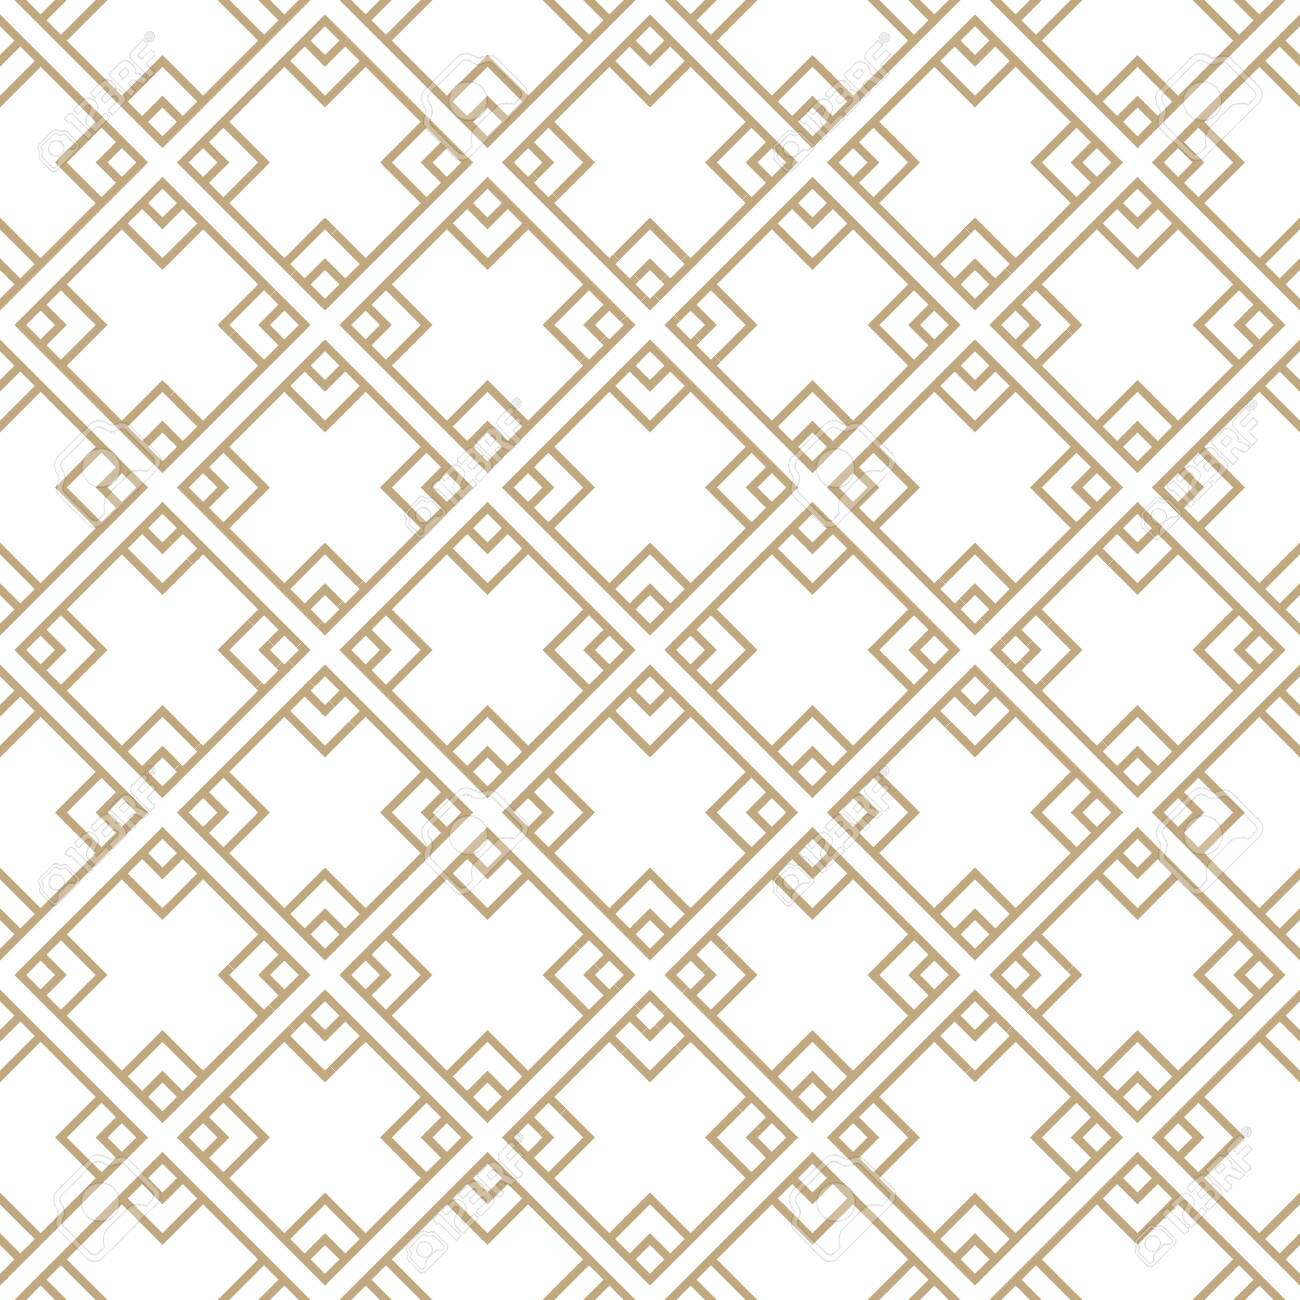 Seamless simple gold geometric pattern. Vector linear modern texture. - 151009456